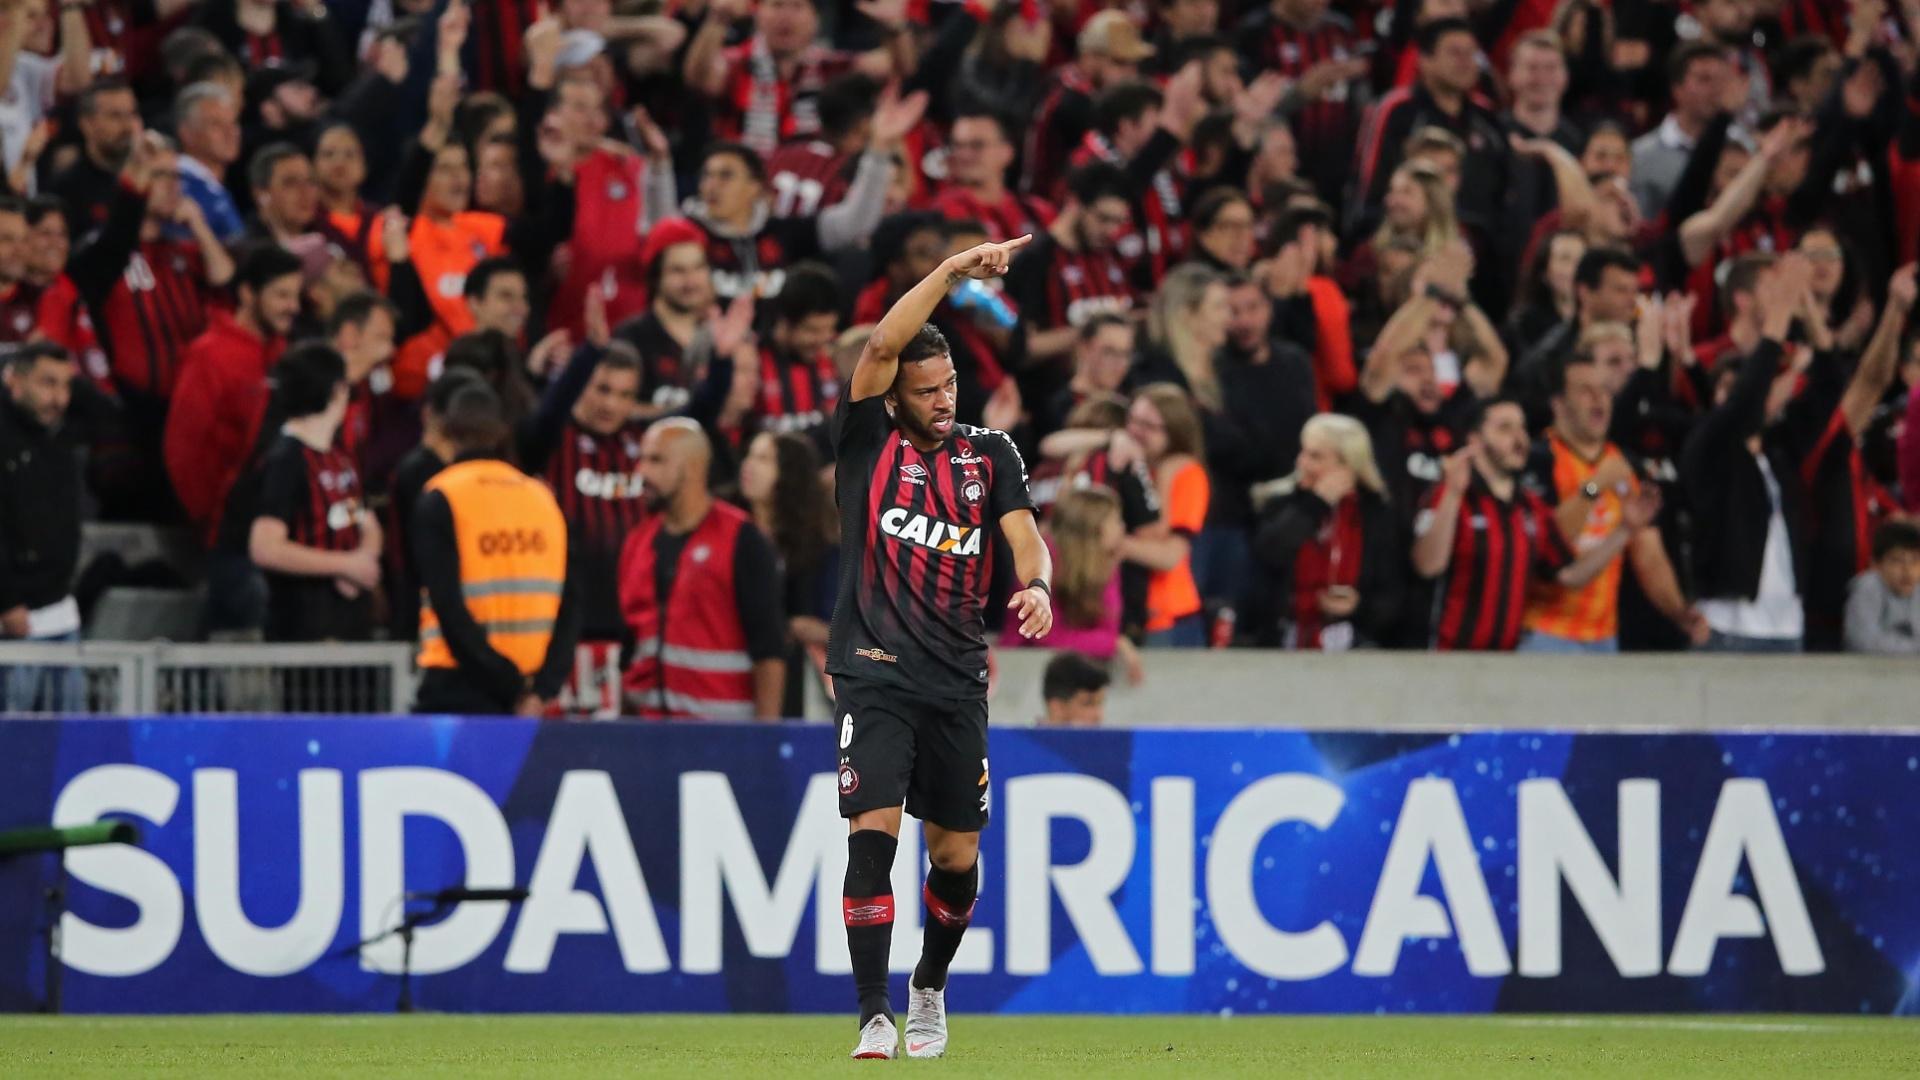 Renan Lodi comemora gol do Atlético-PR em semifinal contra o Fluminense